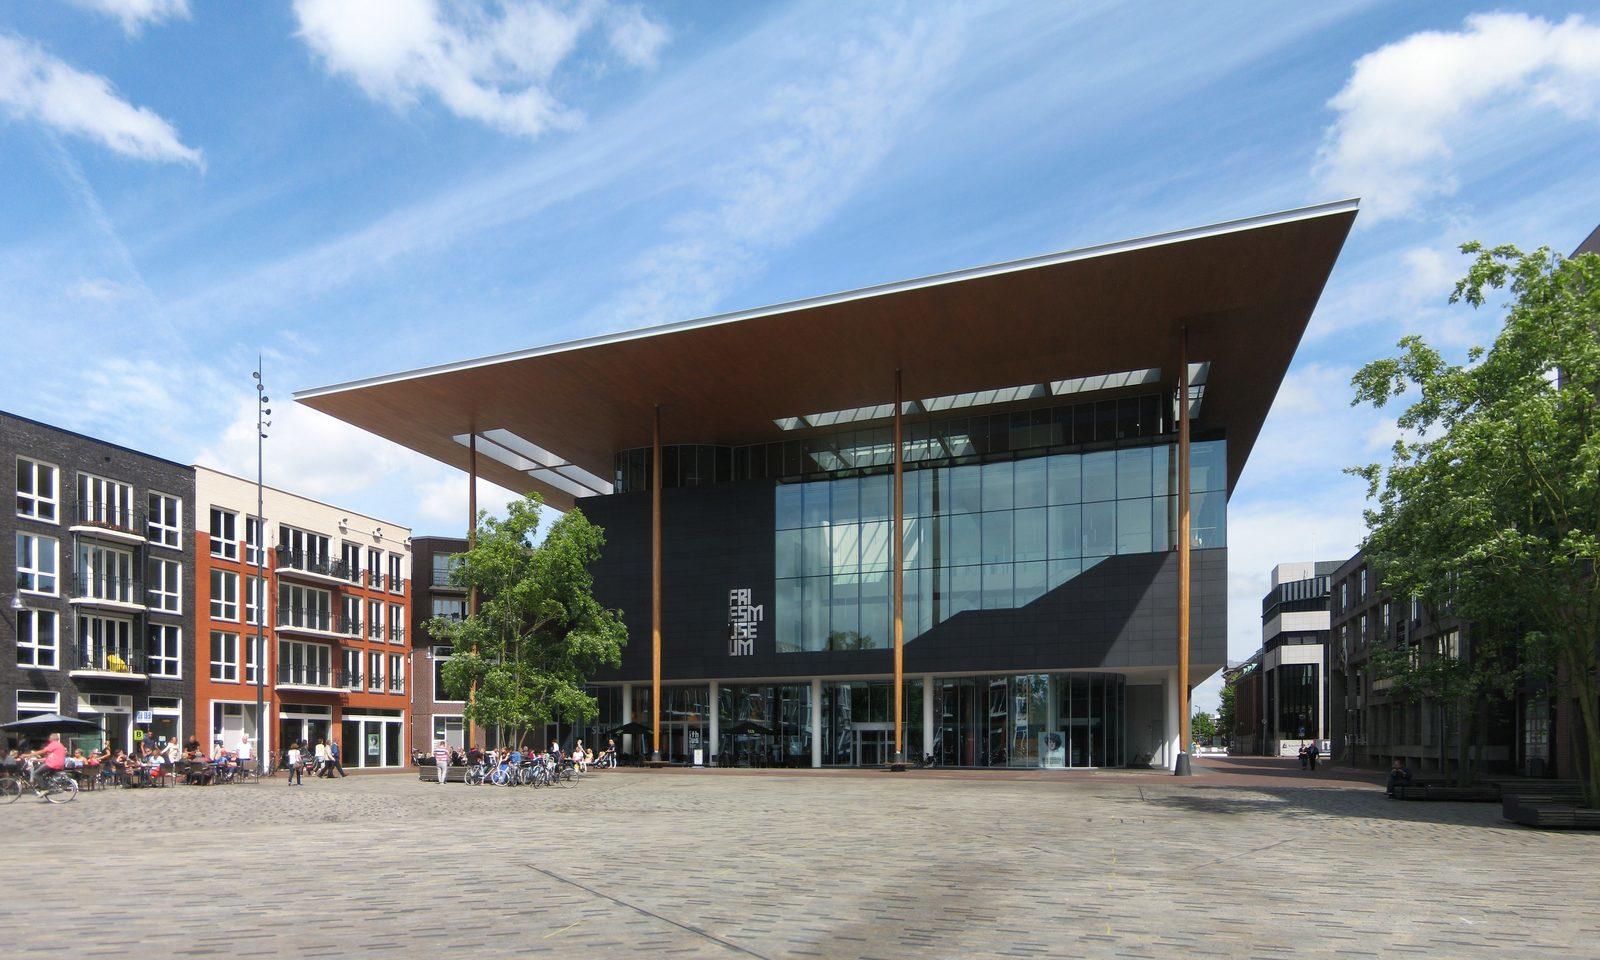 Fries museum – Leeuwarden